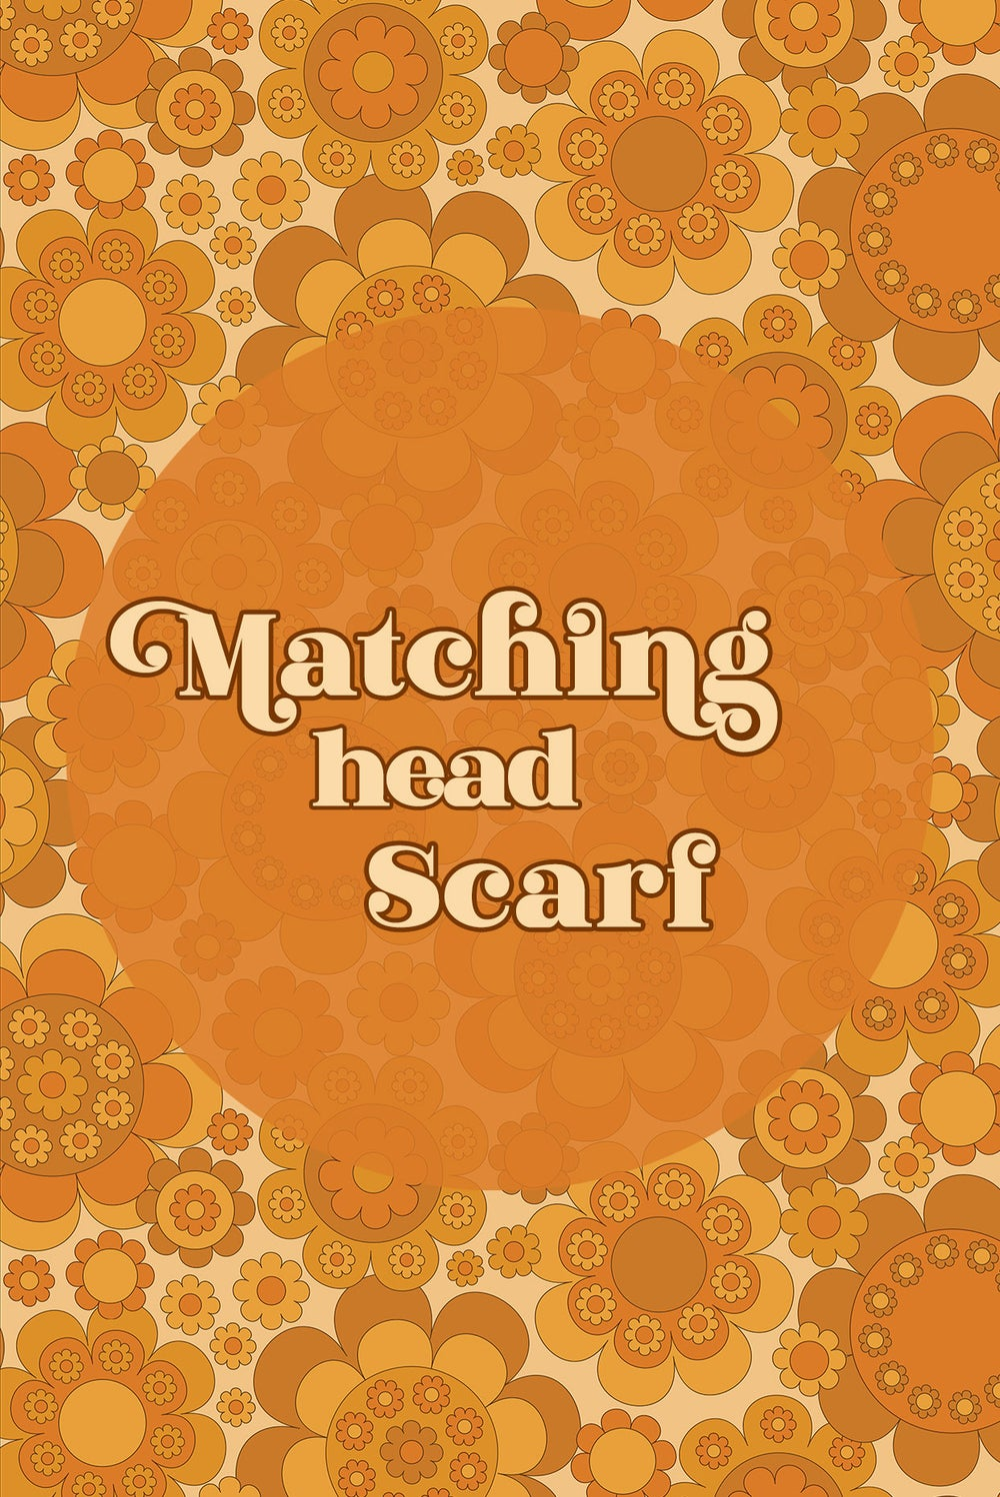 Match head scarf